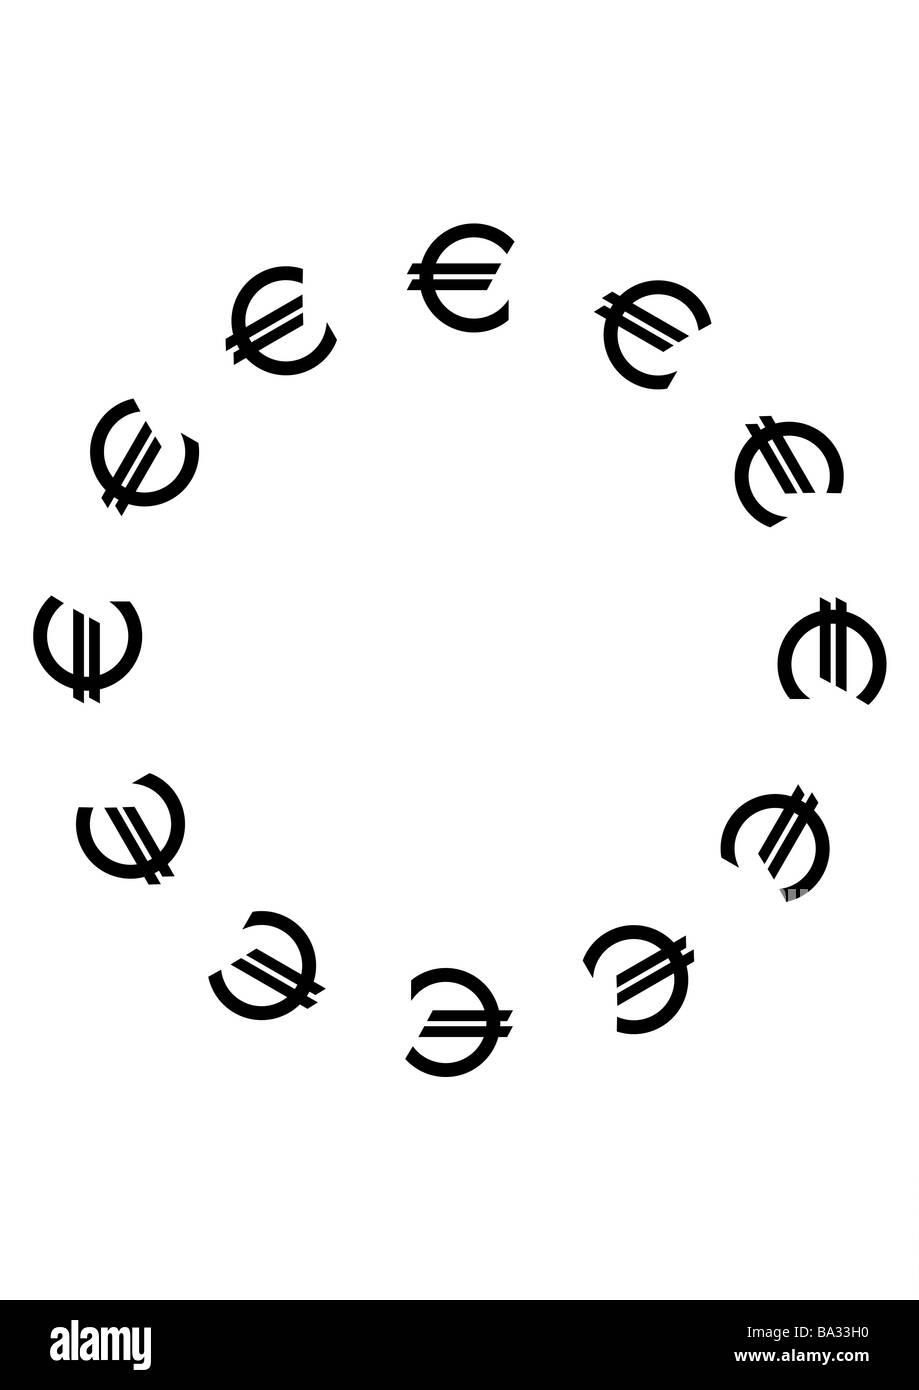 Computer graphics monetary signs euro europe currency euro signs computer graphics monetary signs euro europe currency euro signs monetary symbols symbol economy finances finance market money buycottarizona Gallery